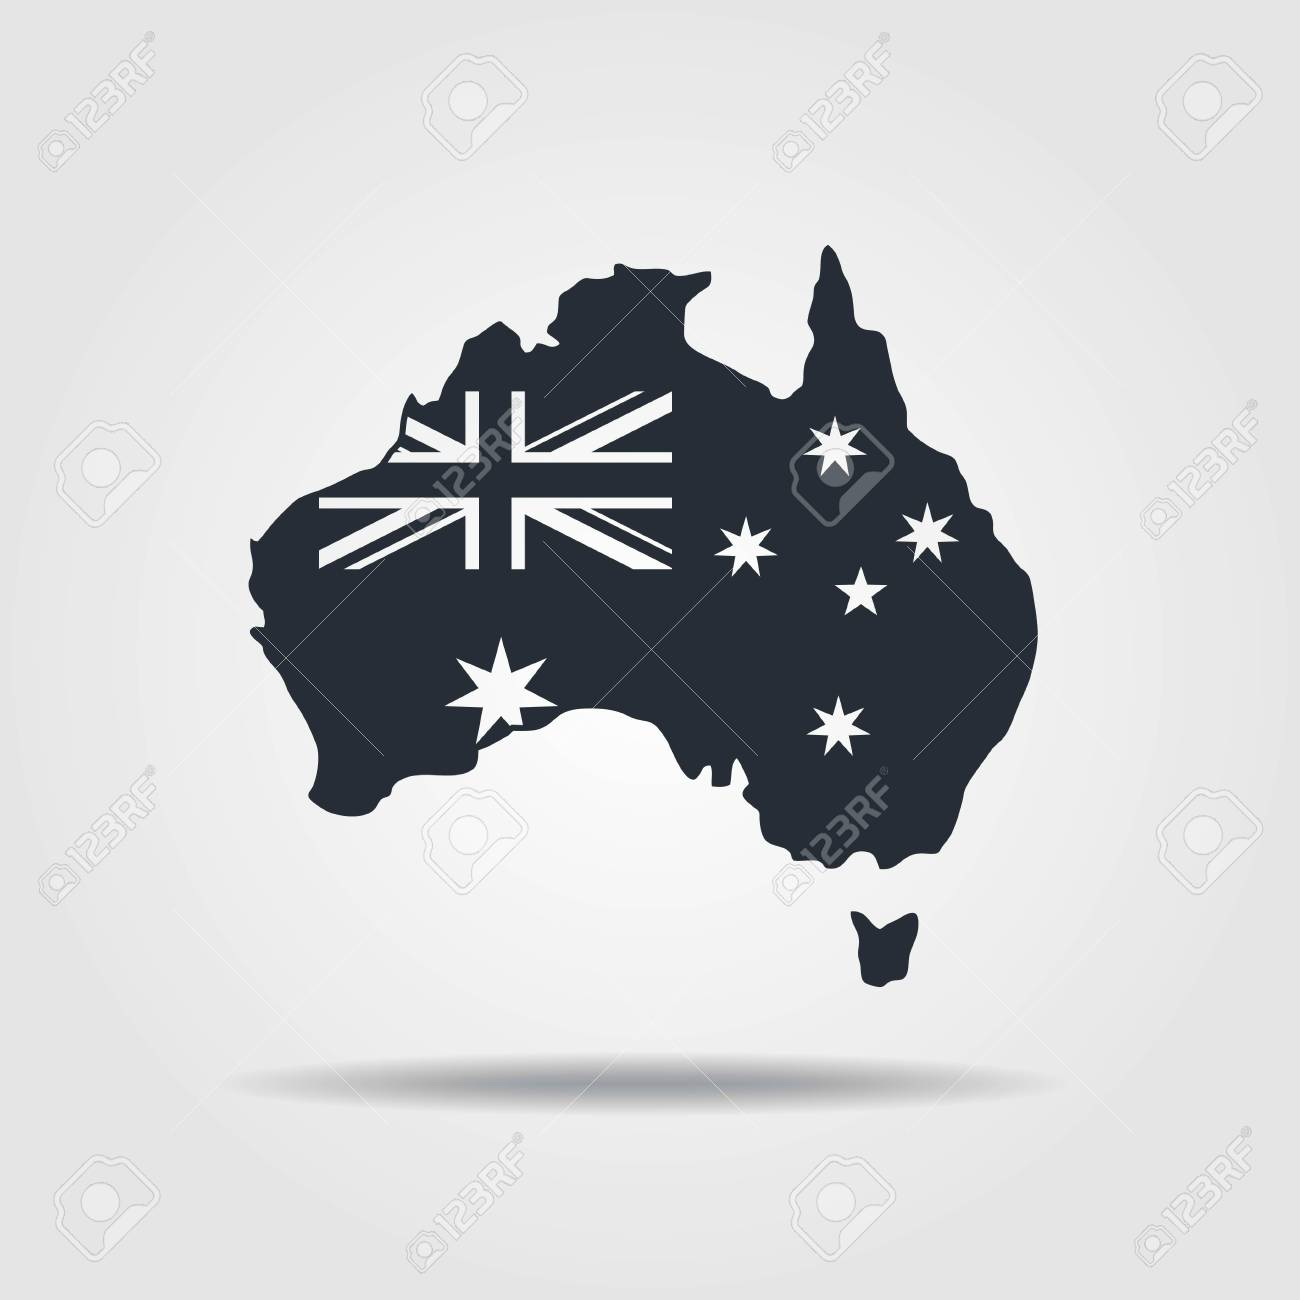 Australia Map Icon.Australia Map Icon With The Flag Vector Illustration